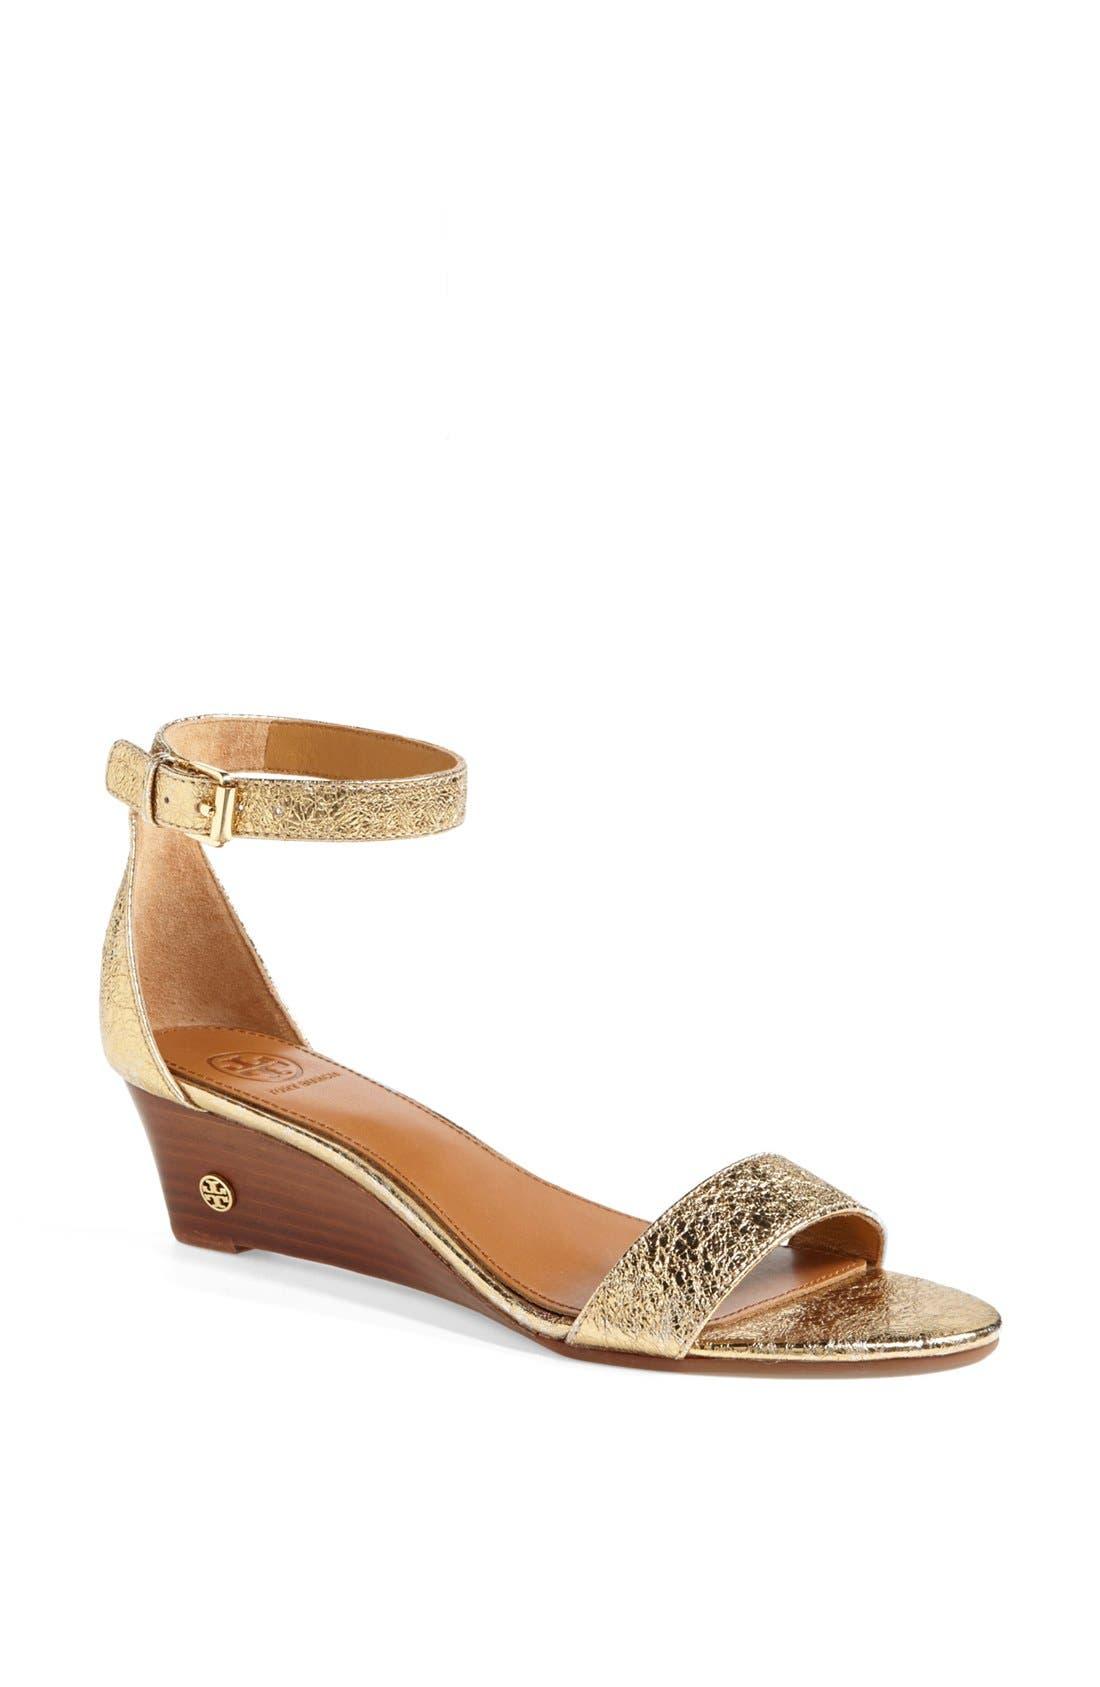 'Savannah' Wedge Sandal,                             Main thumbnail 1, color,                             Gold